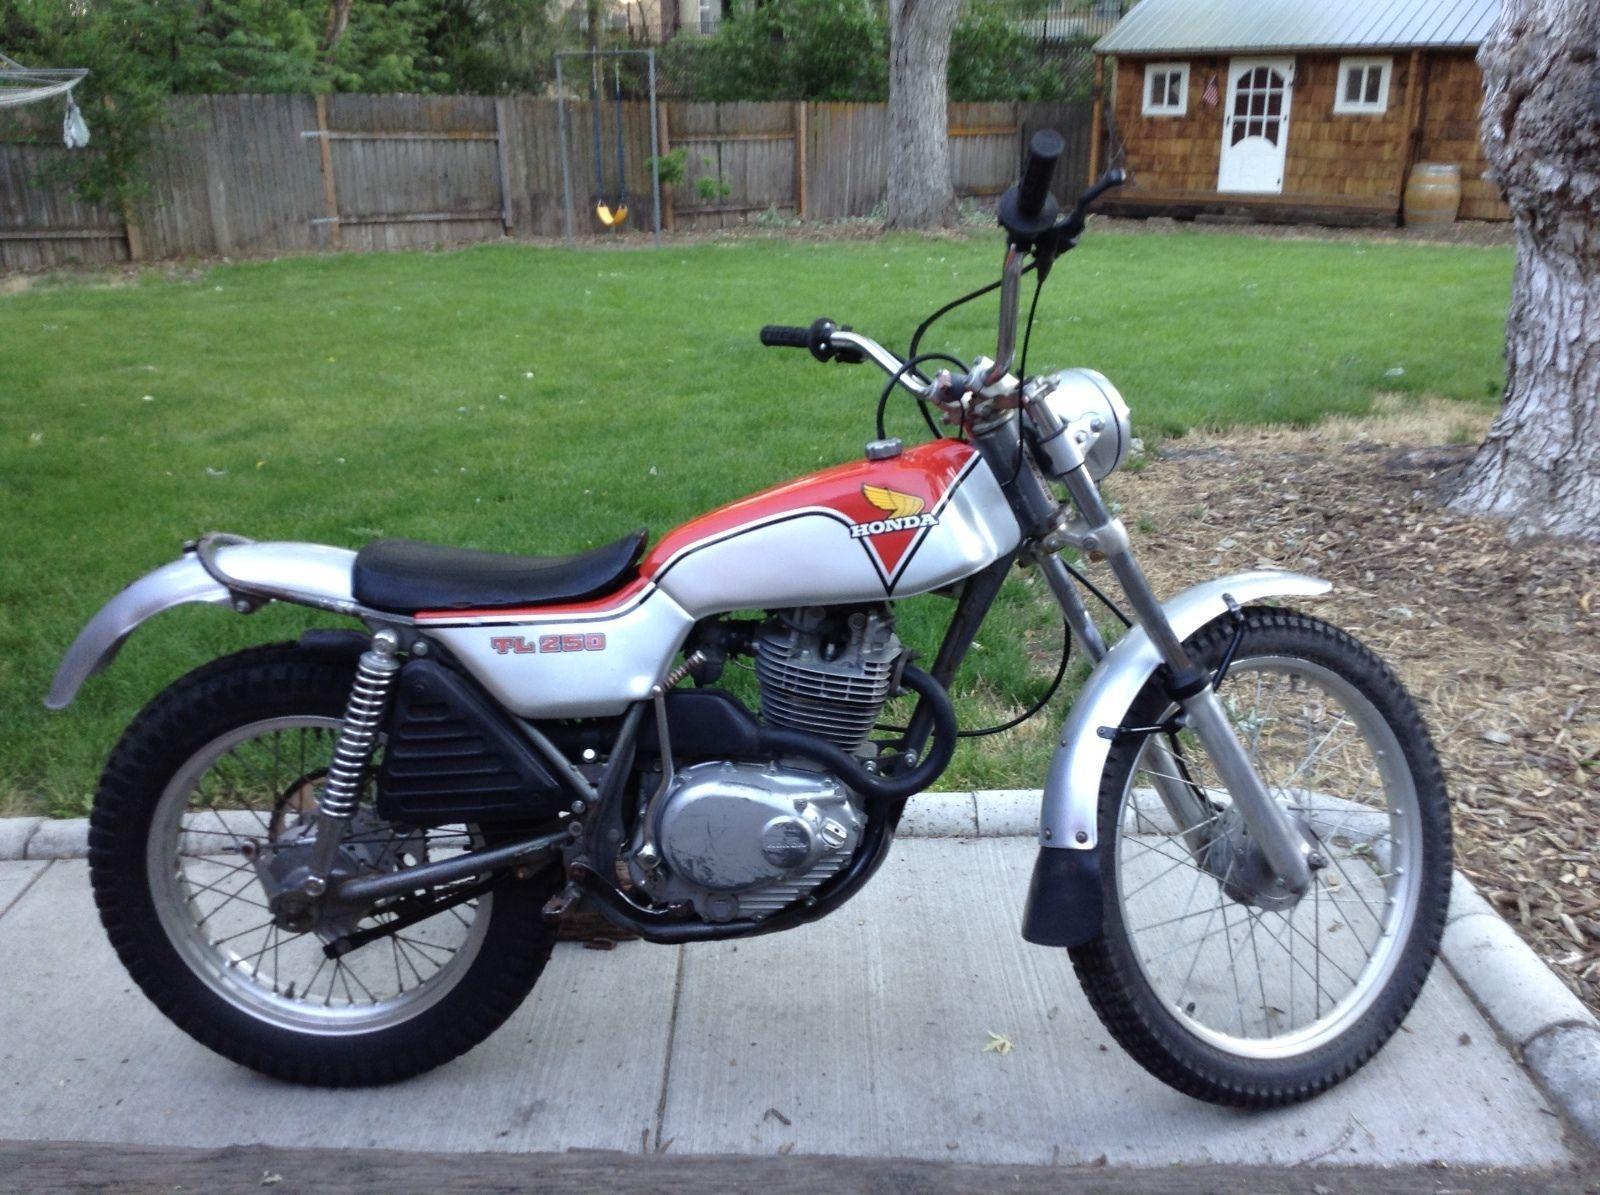 1976 honda tl250 trials motorcycle ebay terry 39 s stuff. Black Bedroom Furniture Sets. Home Design Ideas